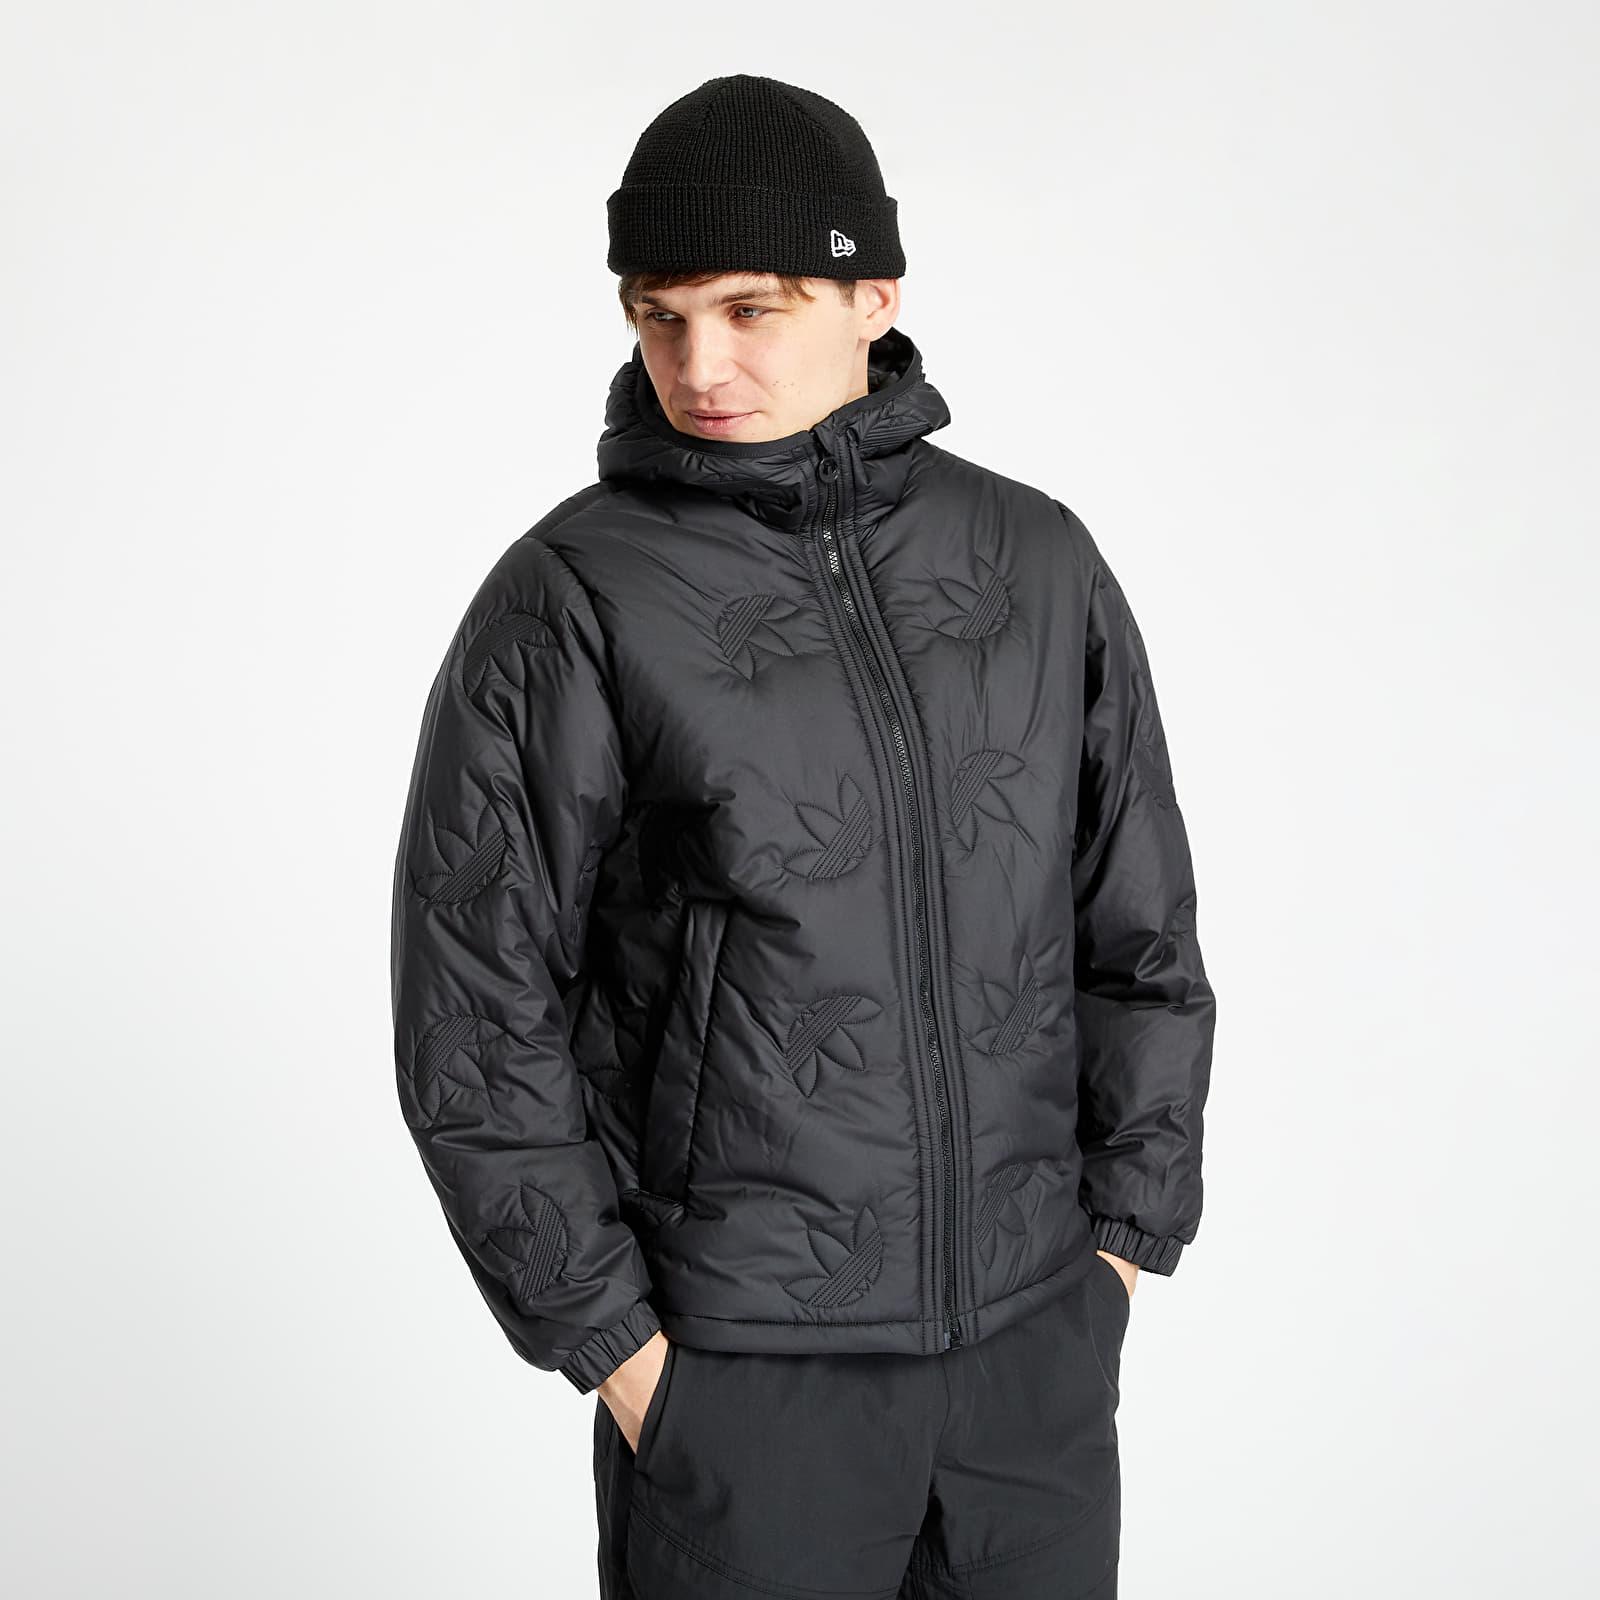 Bundy adidas Trefoil Rpt Puffer Jacket Black